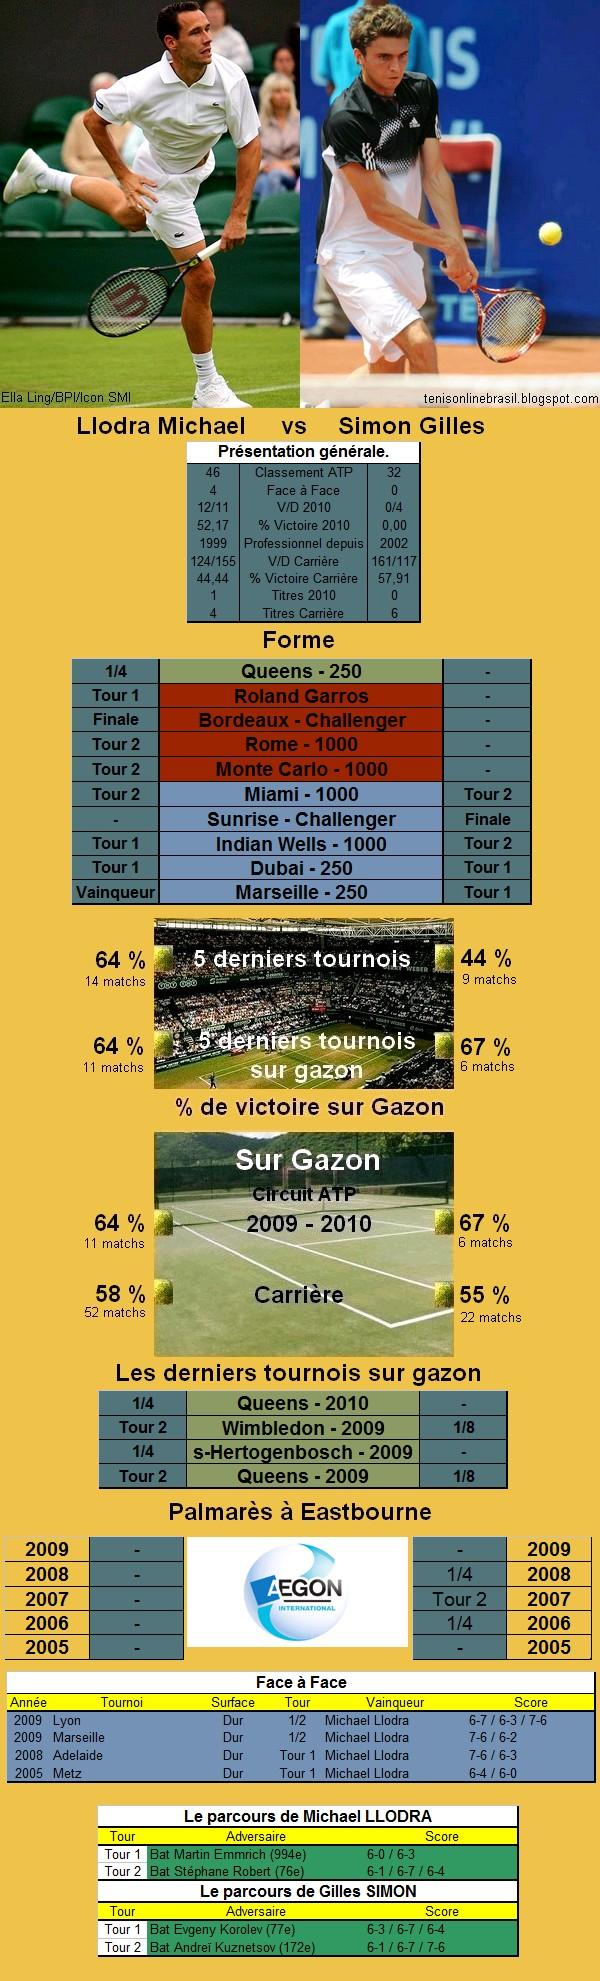 Statistiques tennis de Llodra contre Simon à Eastbourne